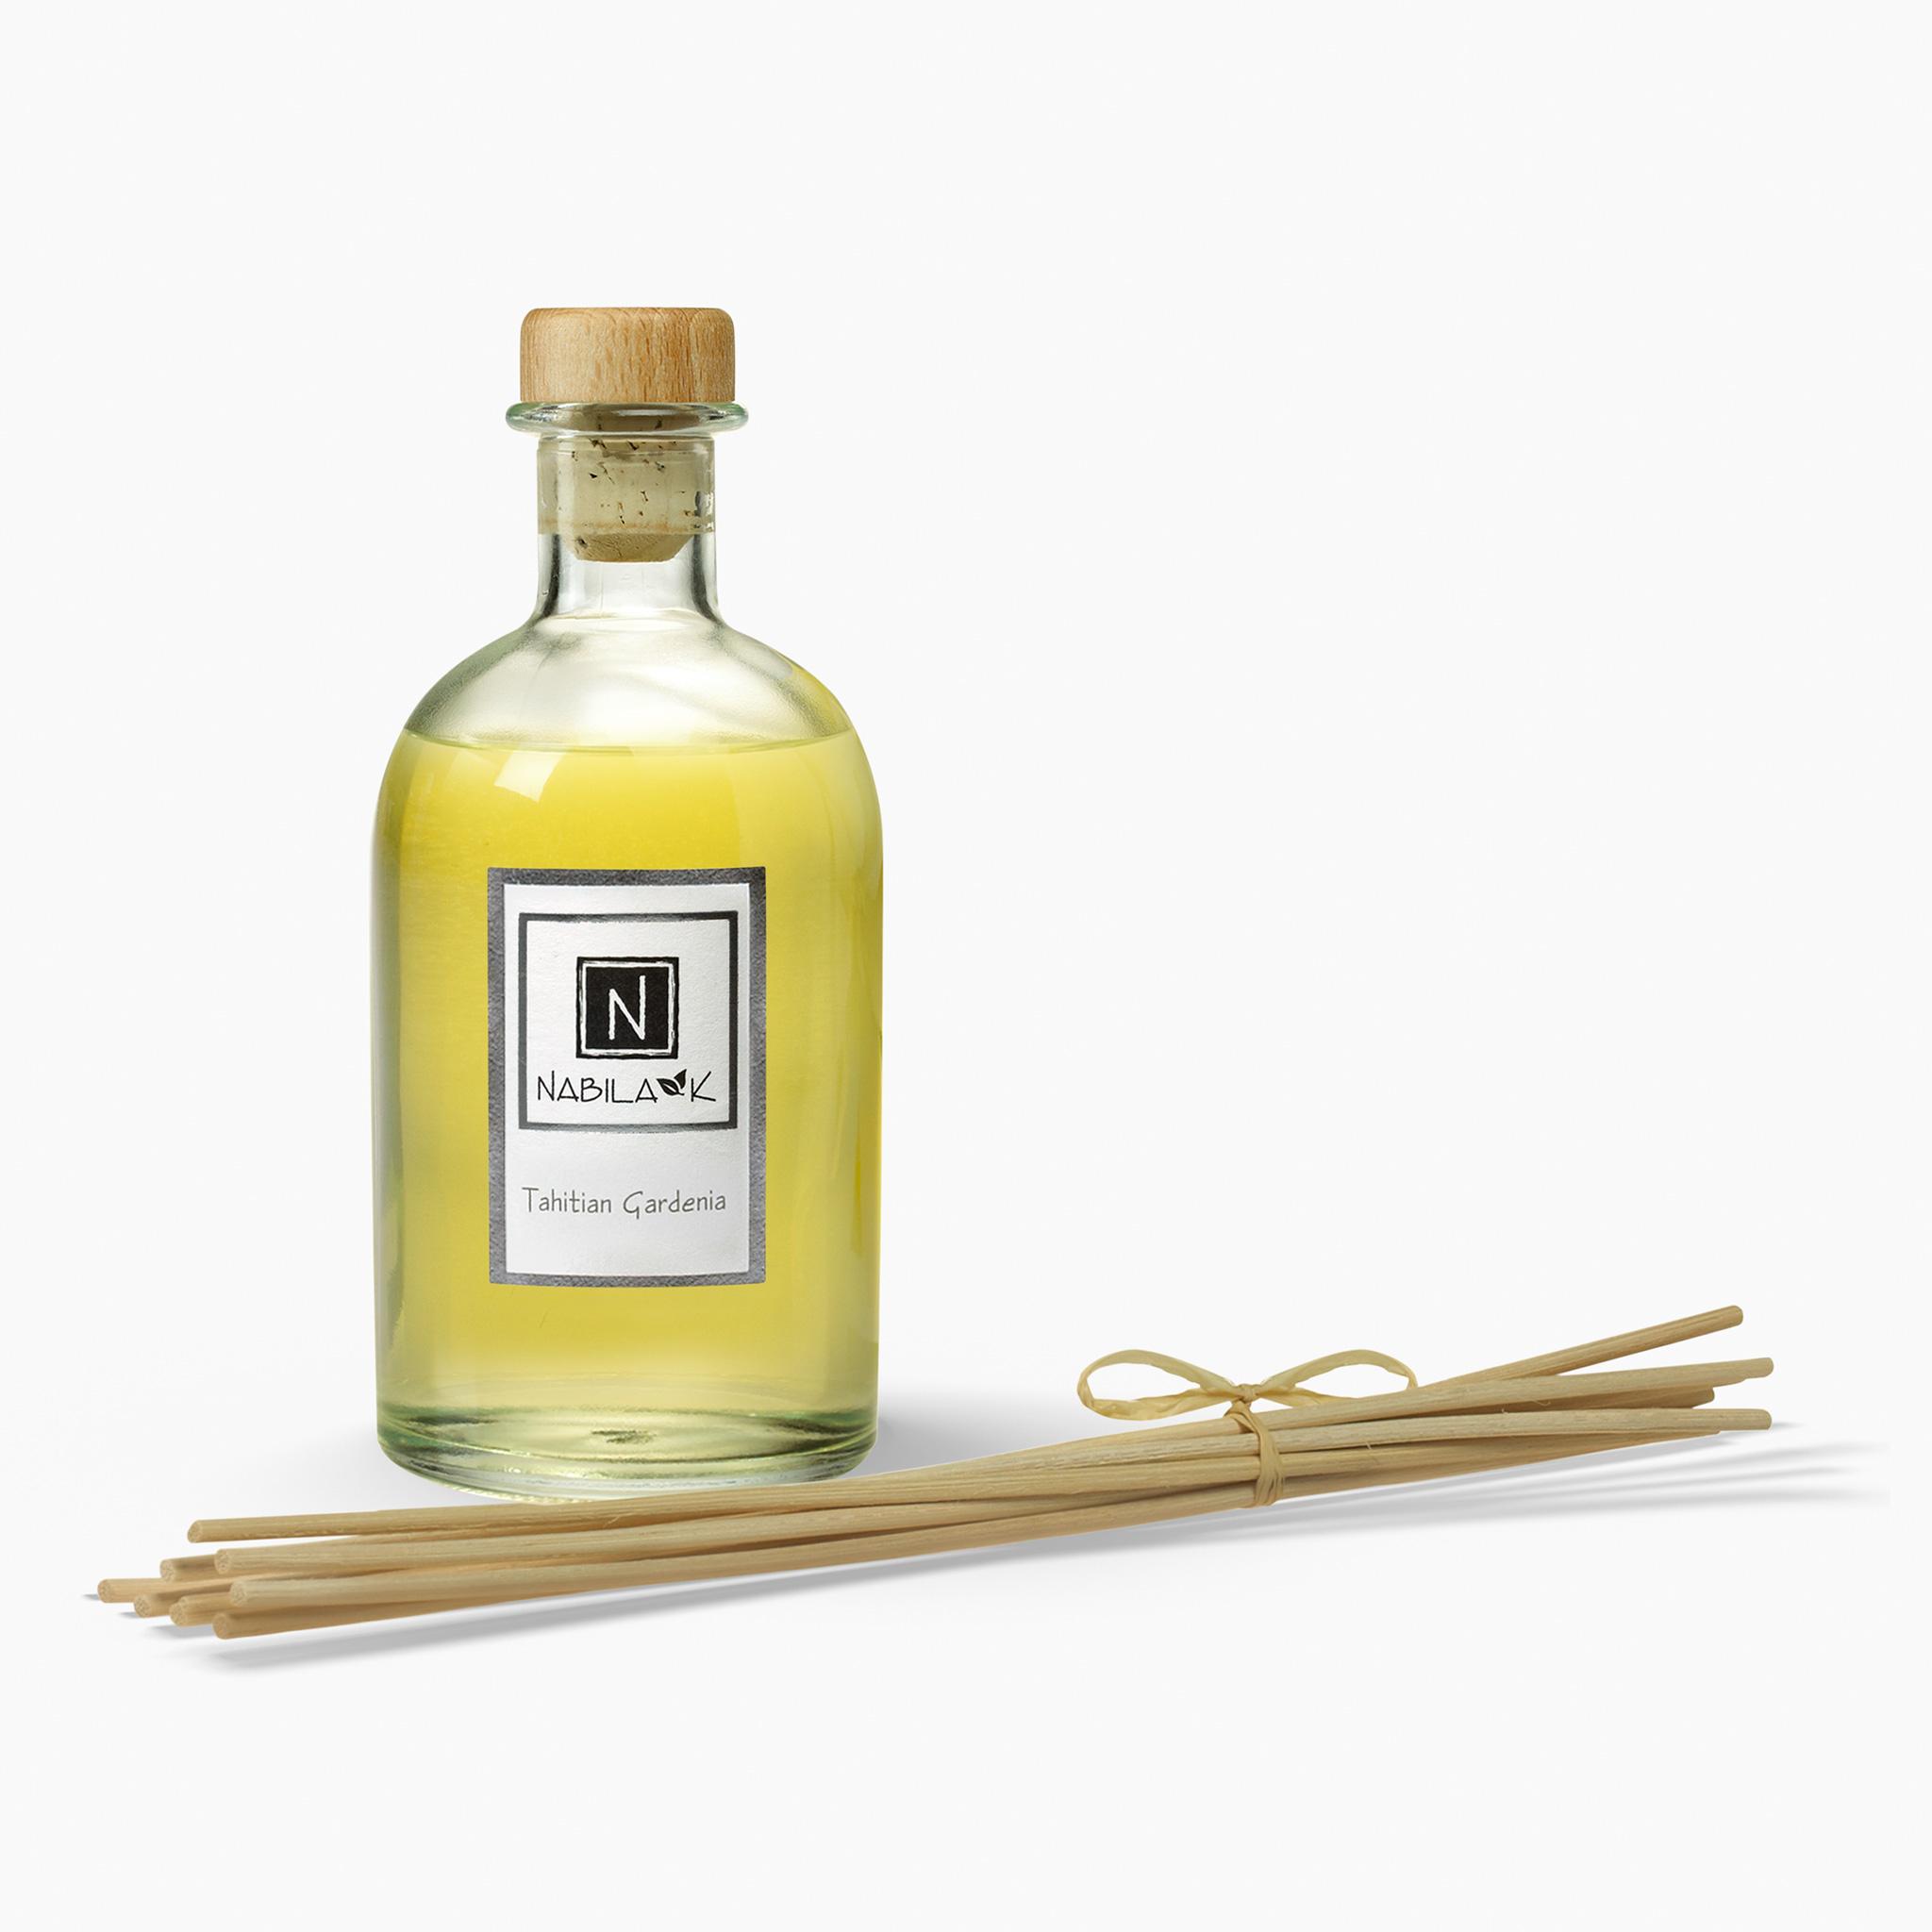 1 Bottle of Nabila K's Tahitian Gardenia Diffuser with Reeds